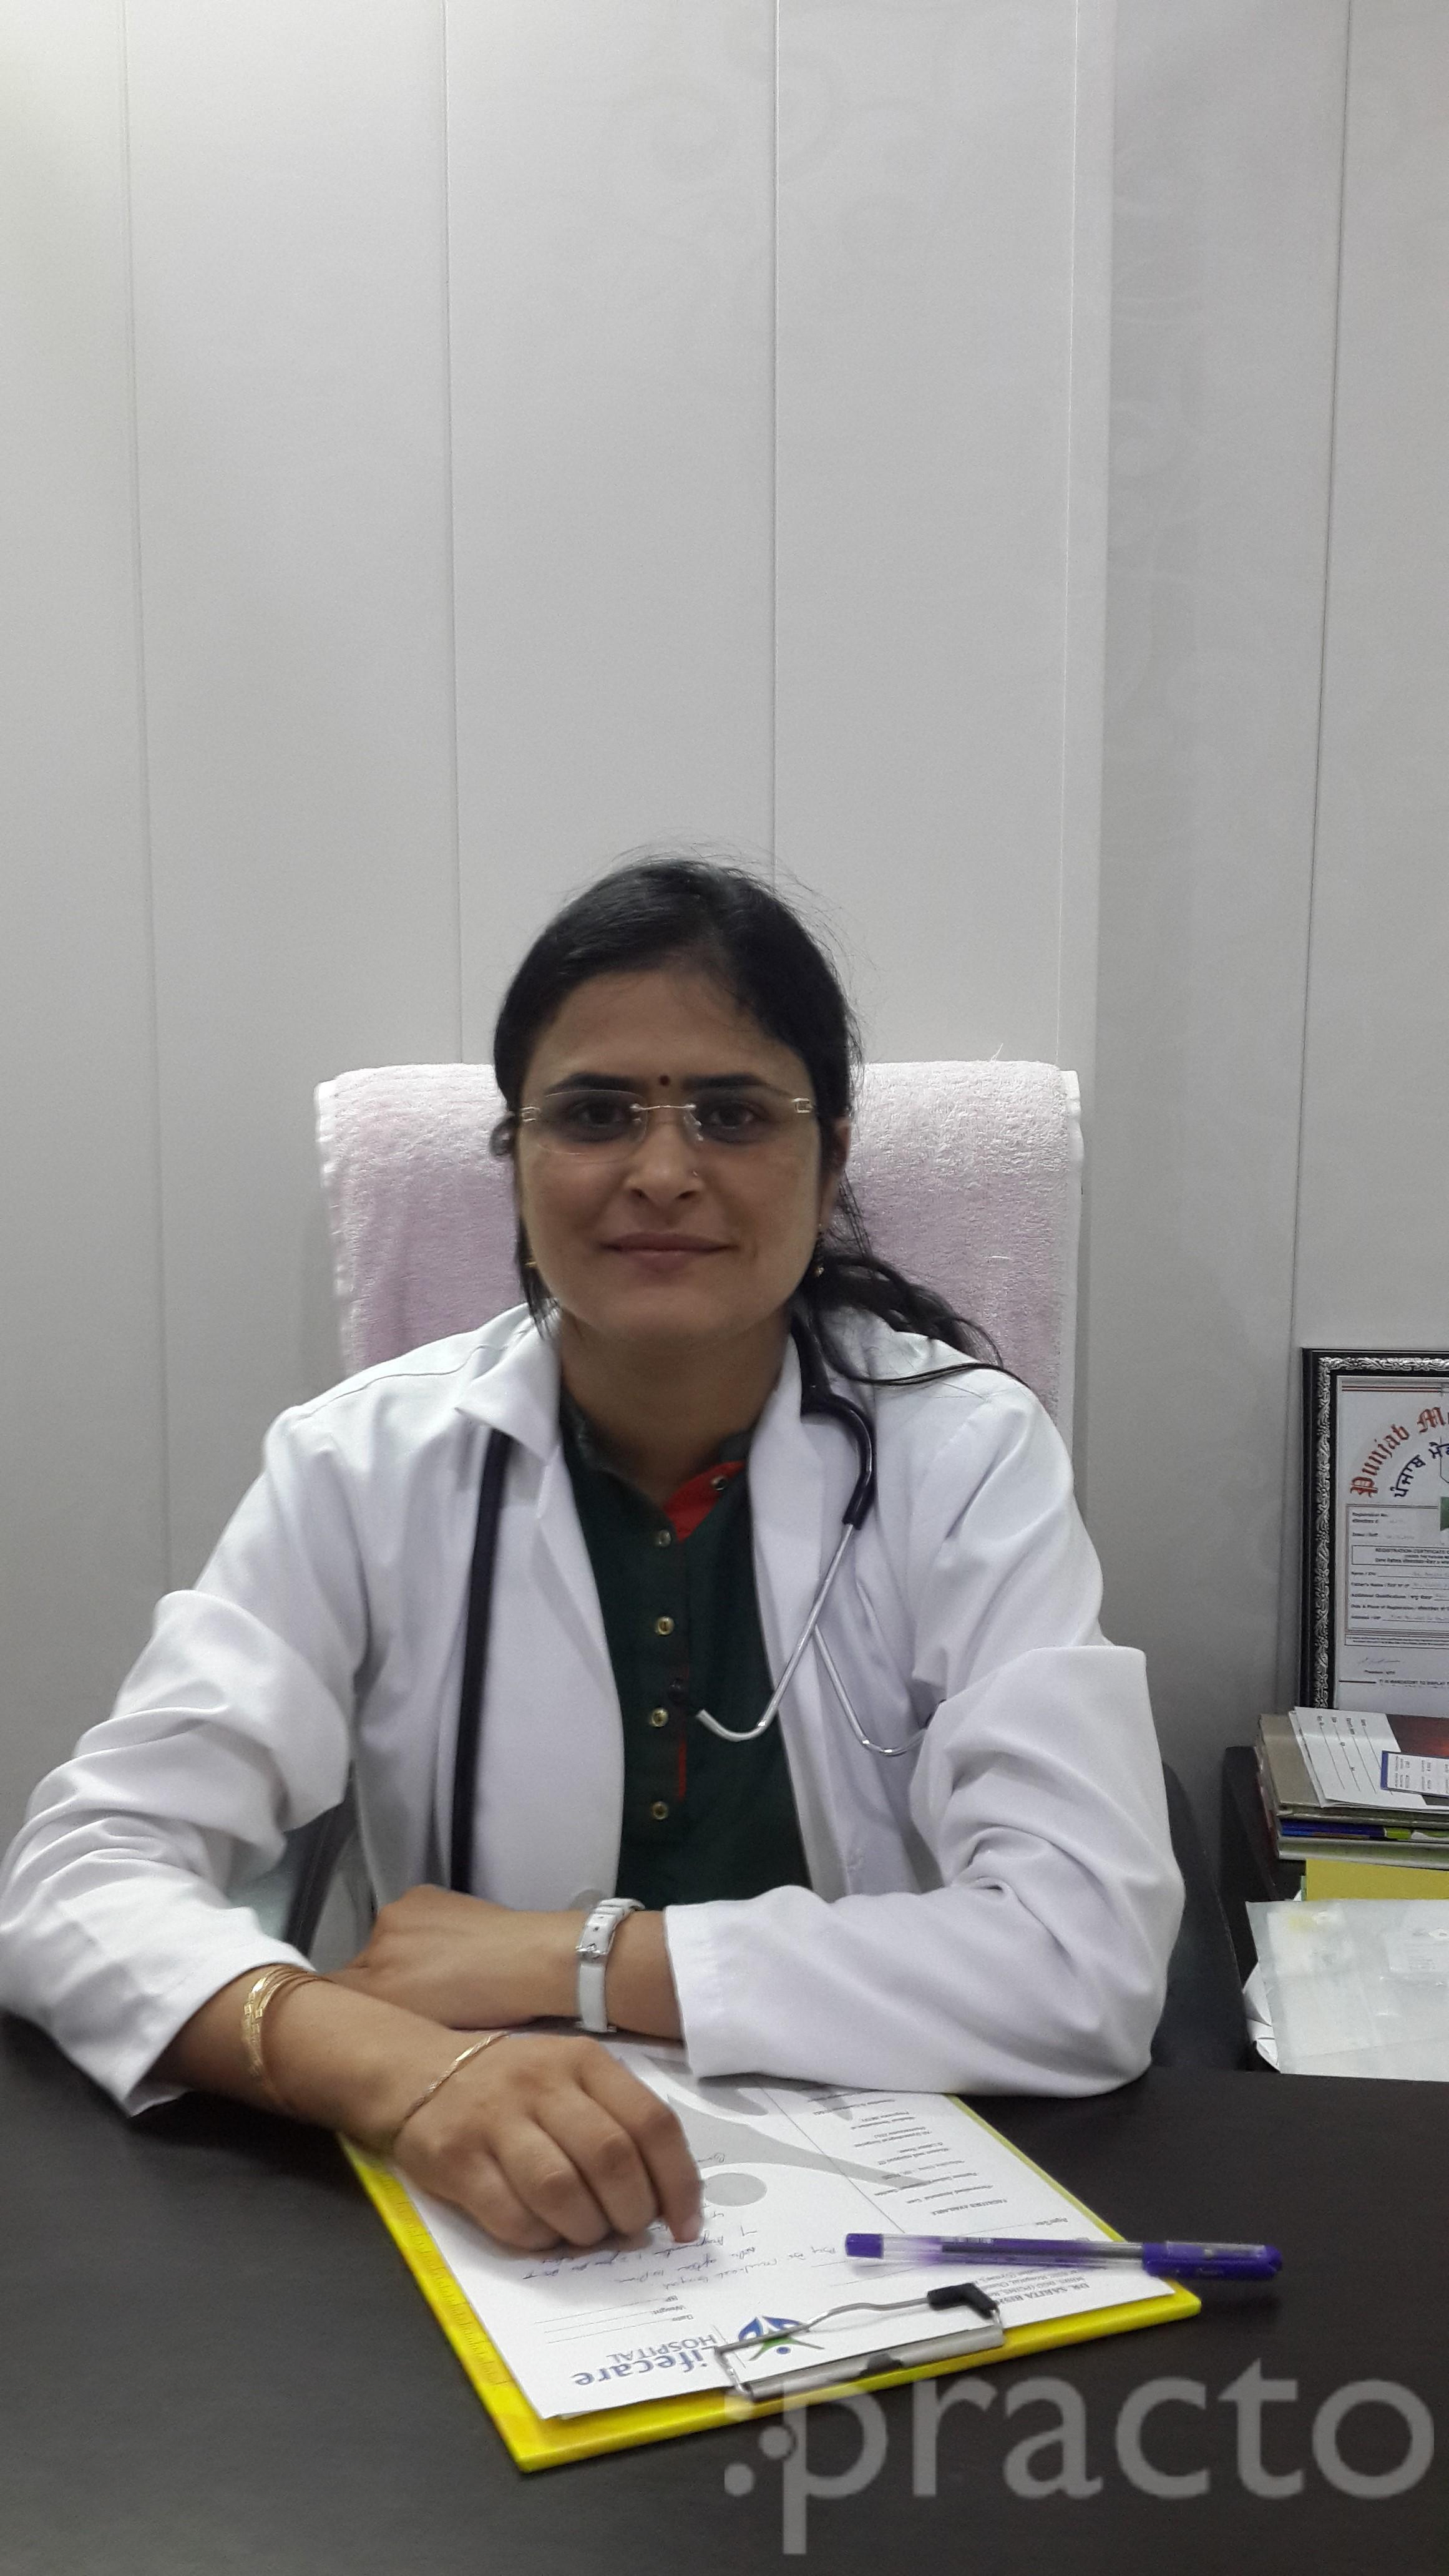 Dr. Sarita Bishnoi - Gynecologist/Obstetrician